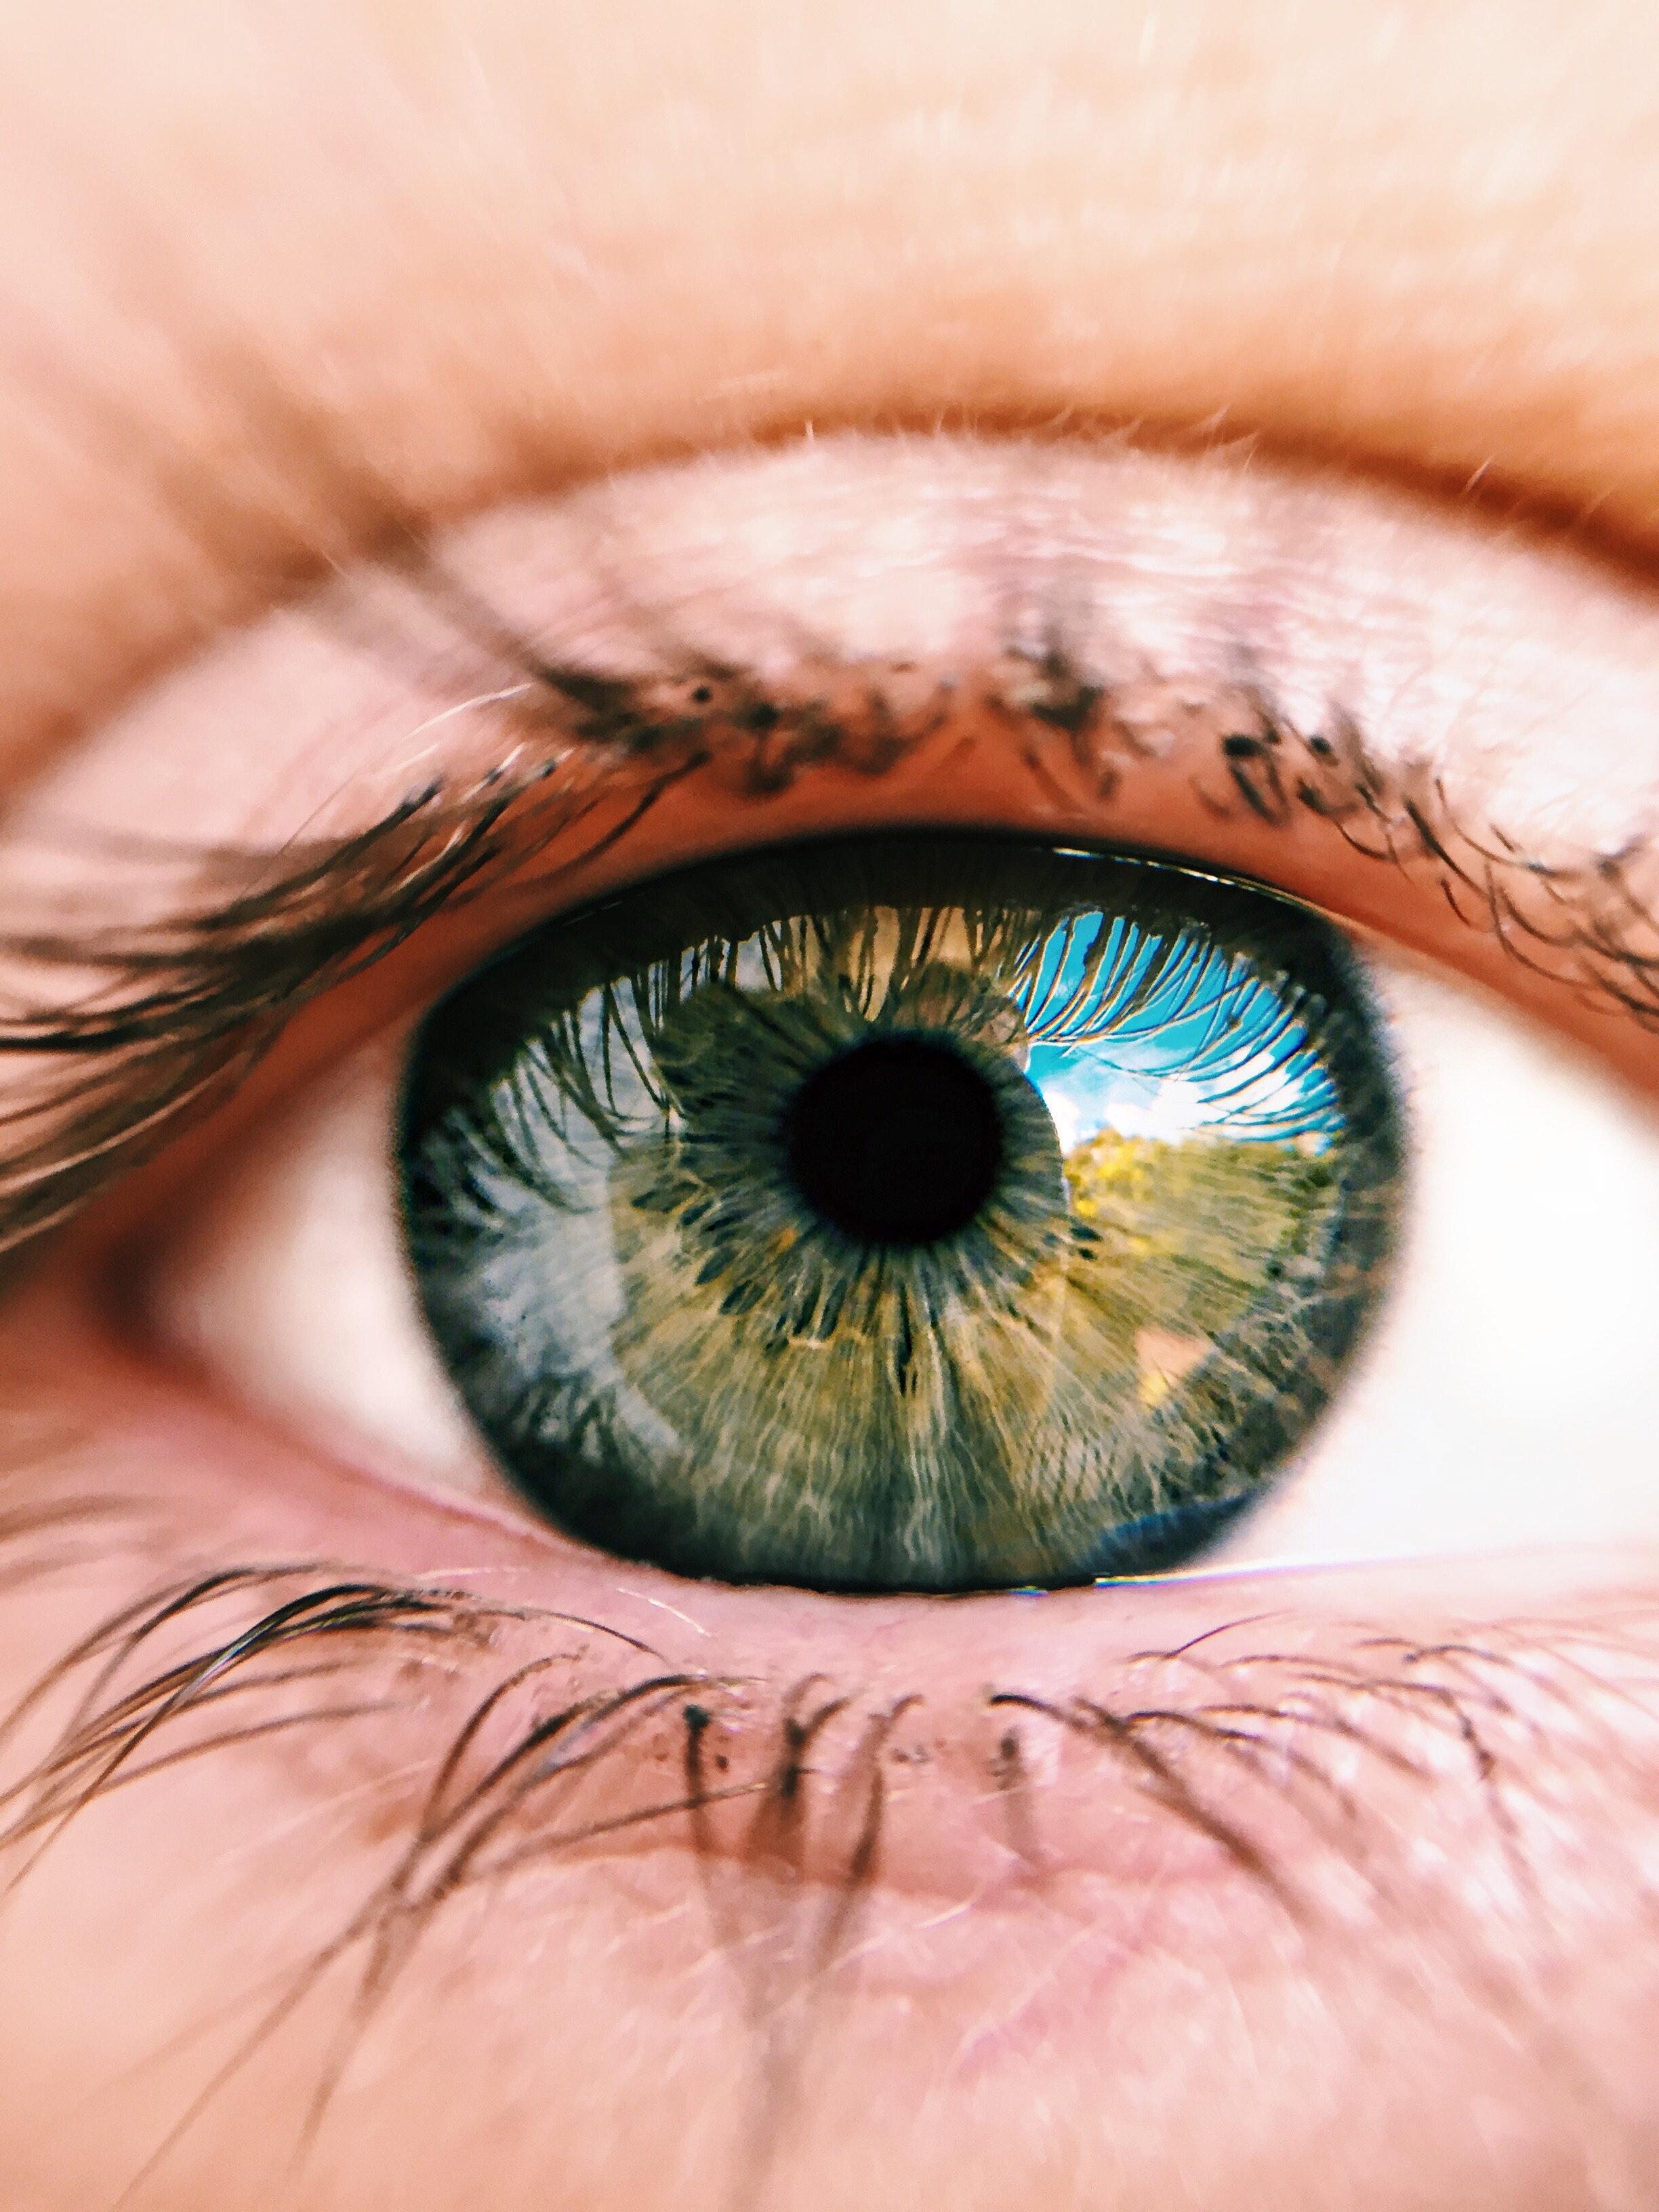 200  eye photos  u00b7 pexels  u00b7 free stock photos